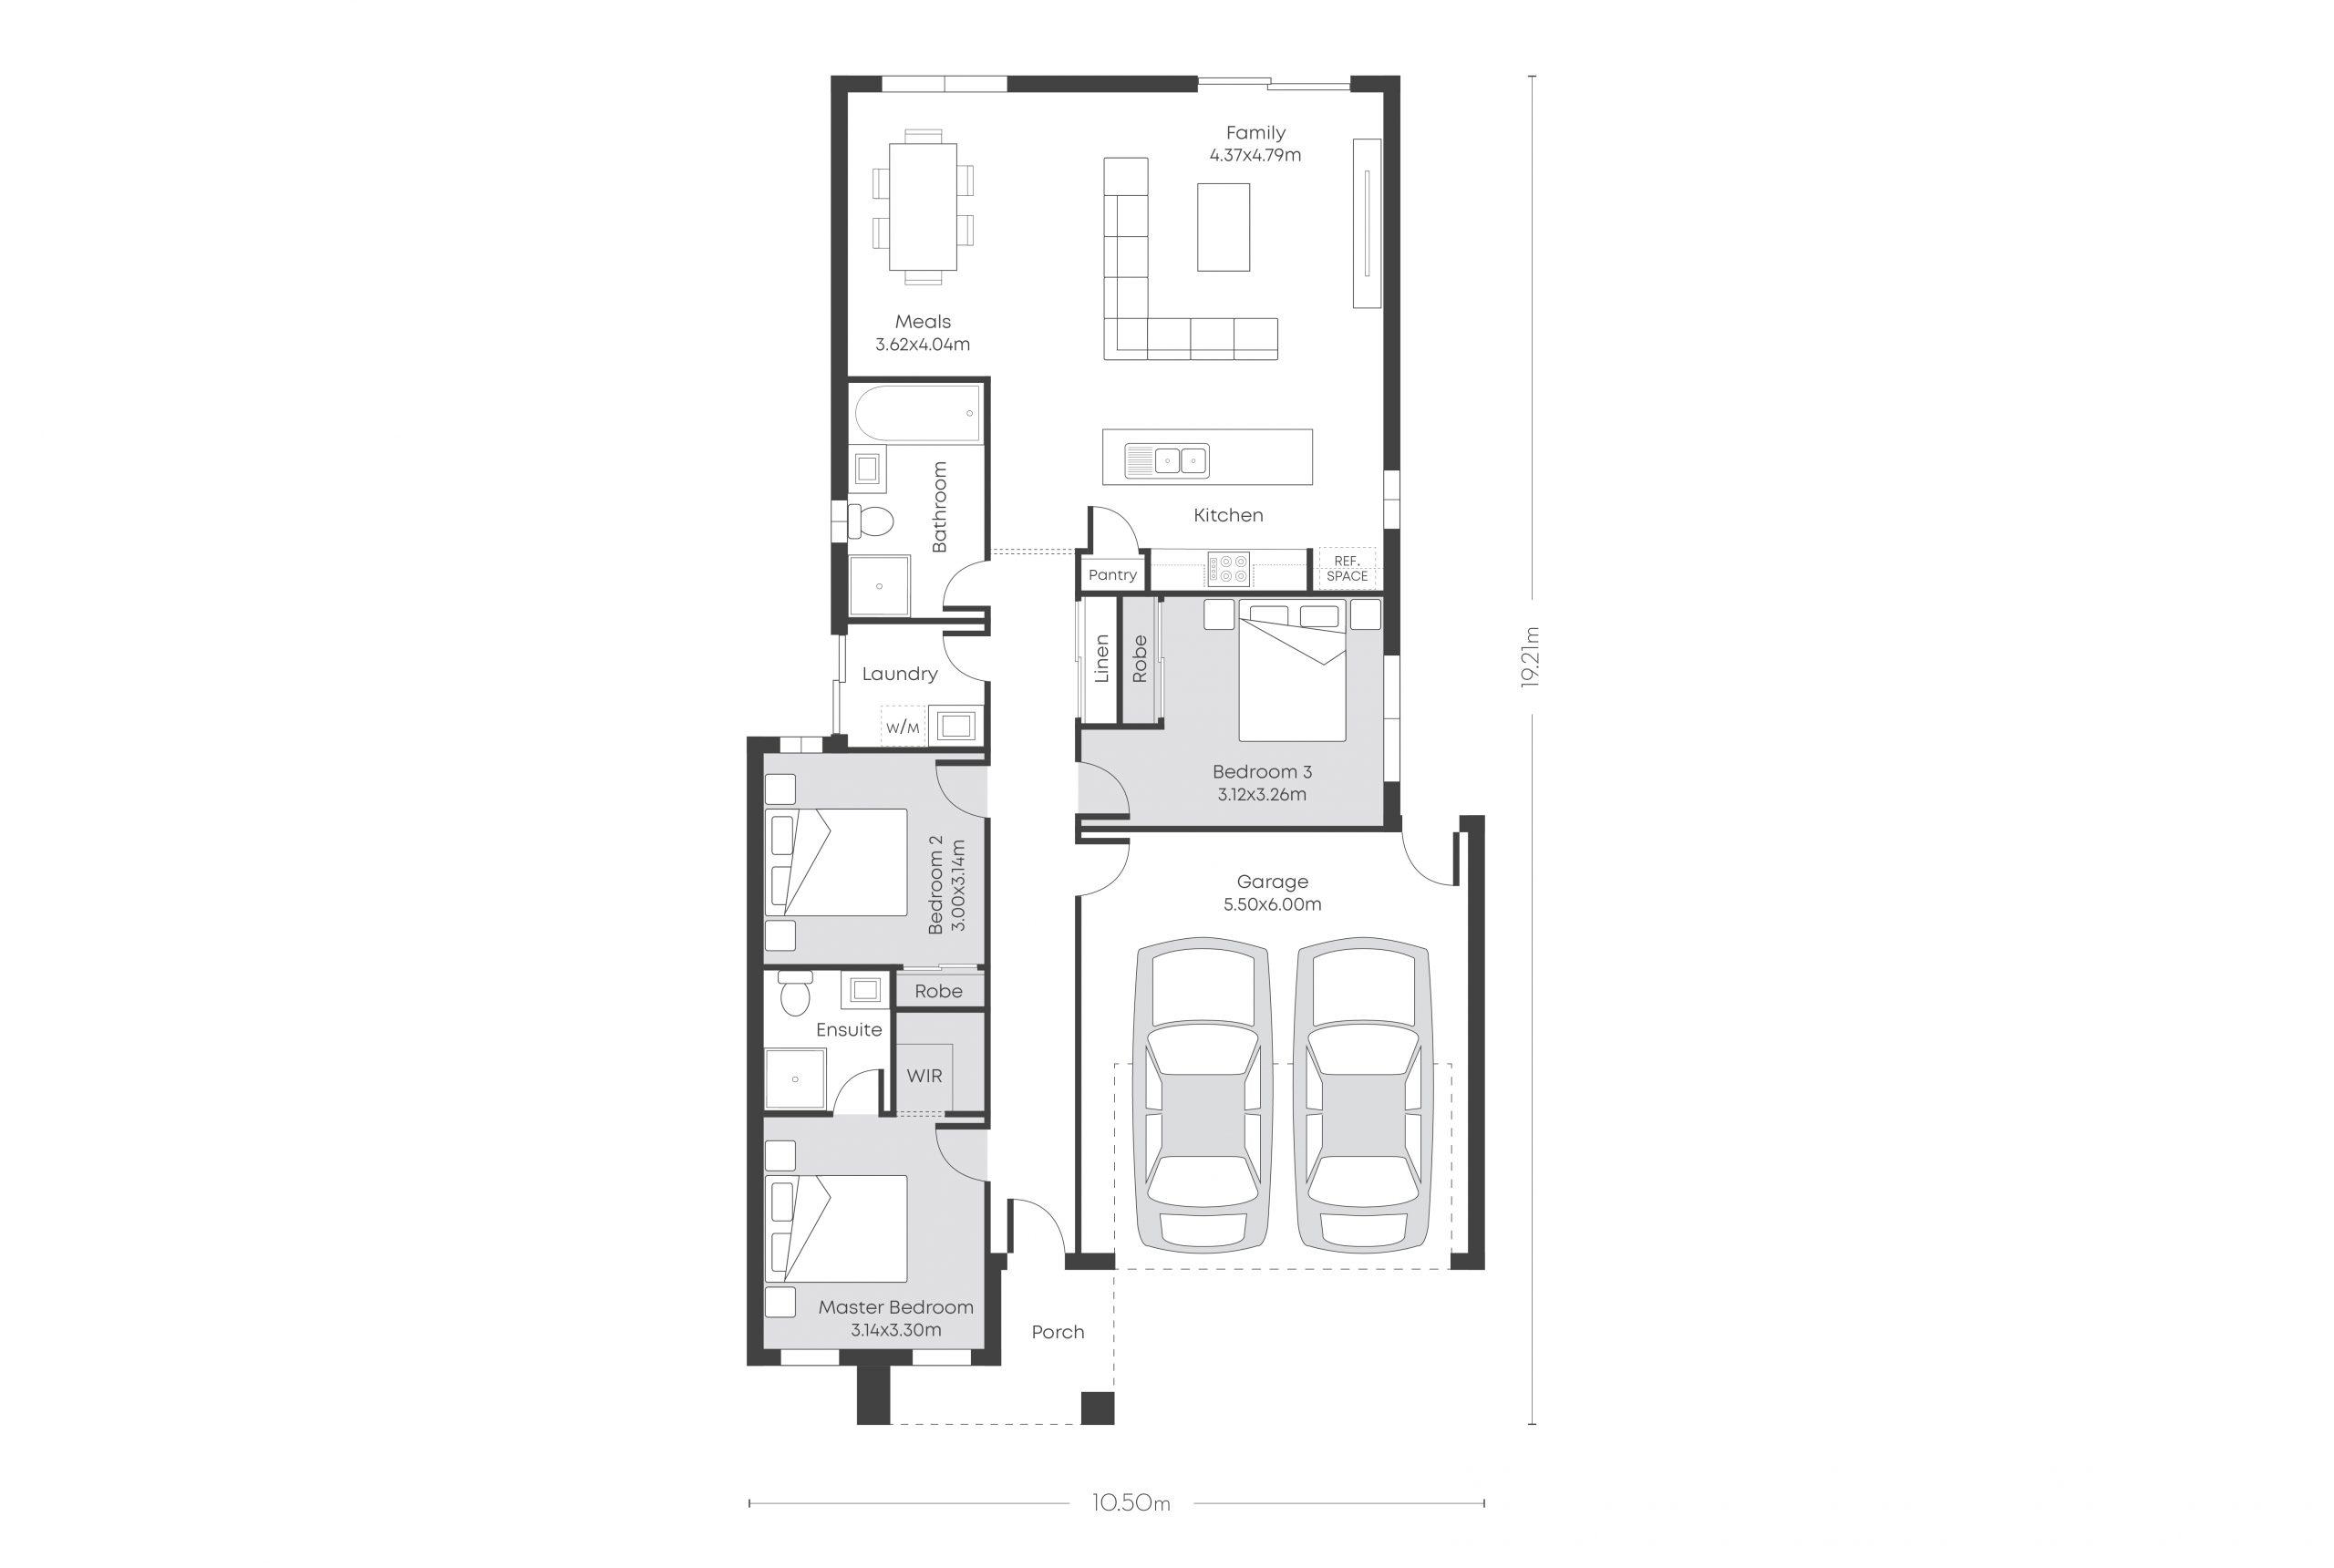 Lisbon 18 Floor Plans